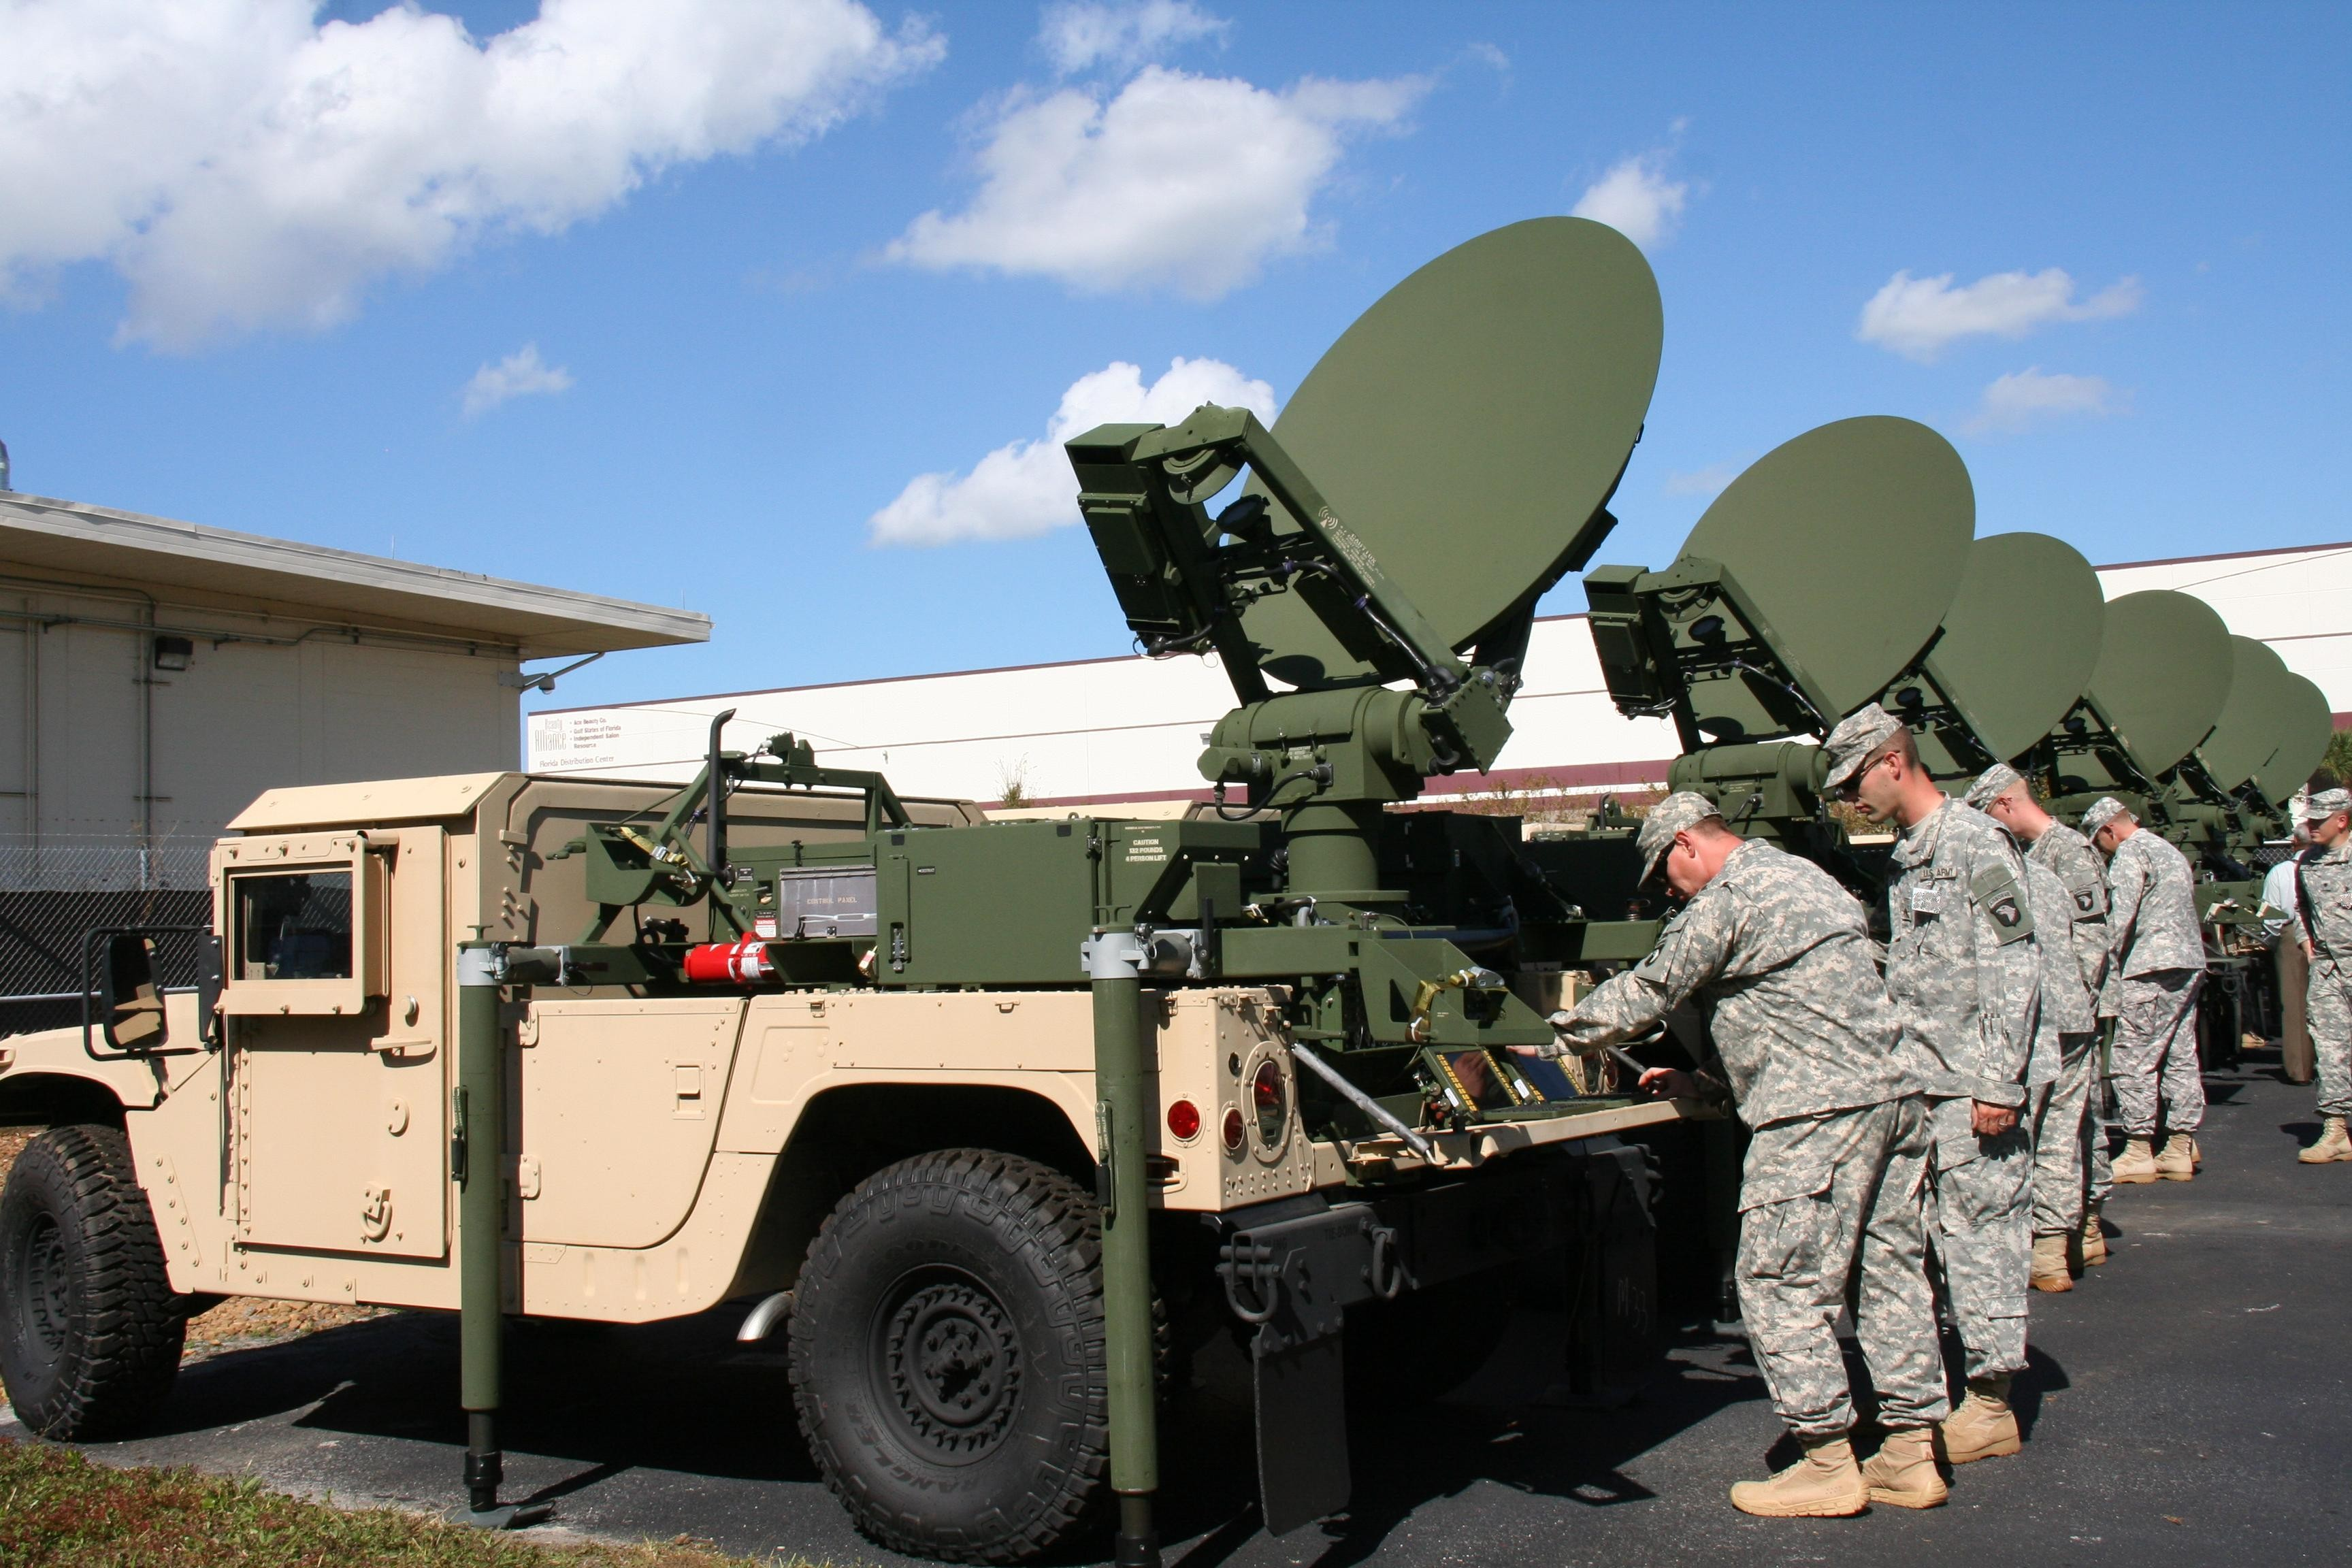 Communications jamming handbook - satellite communications jamming leathers